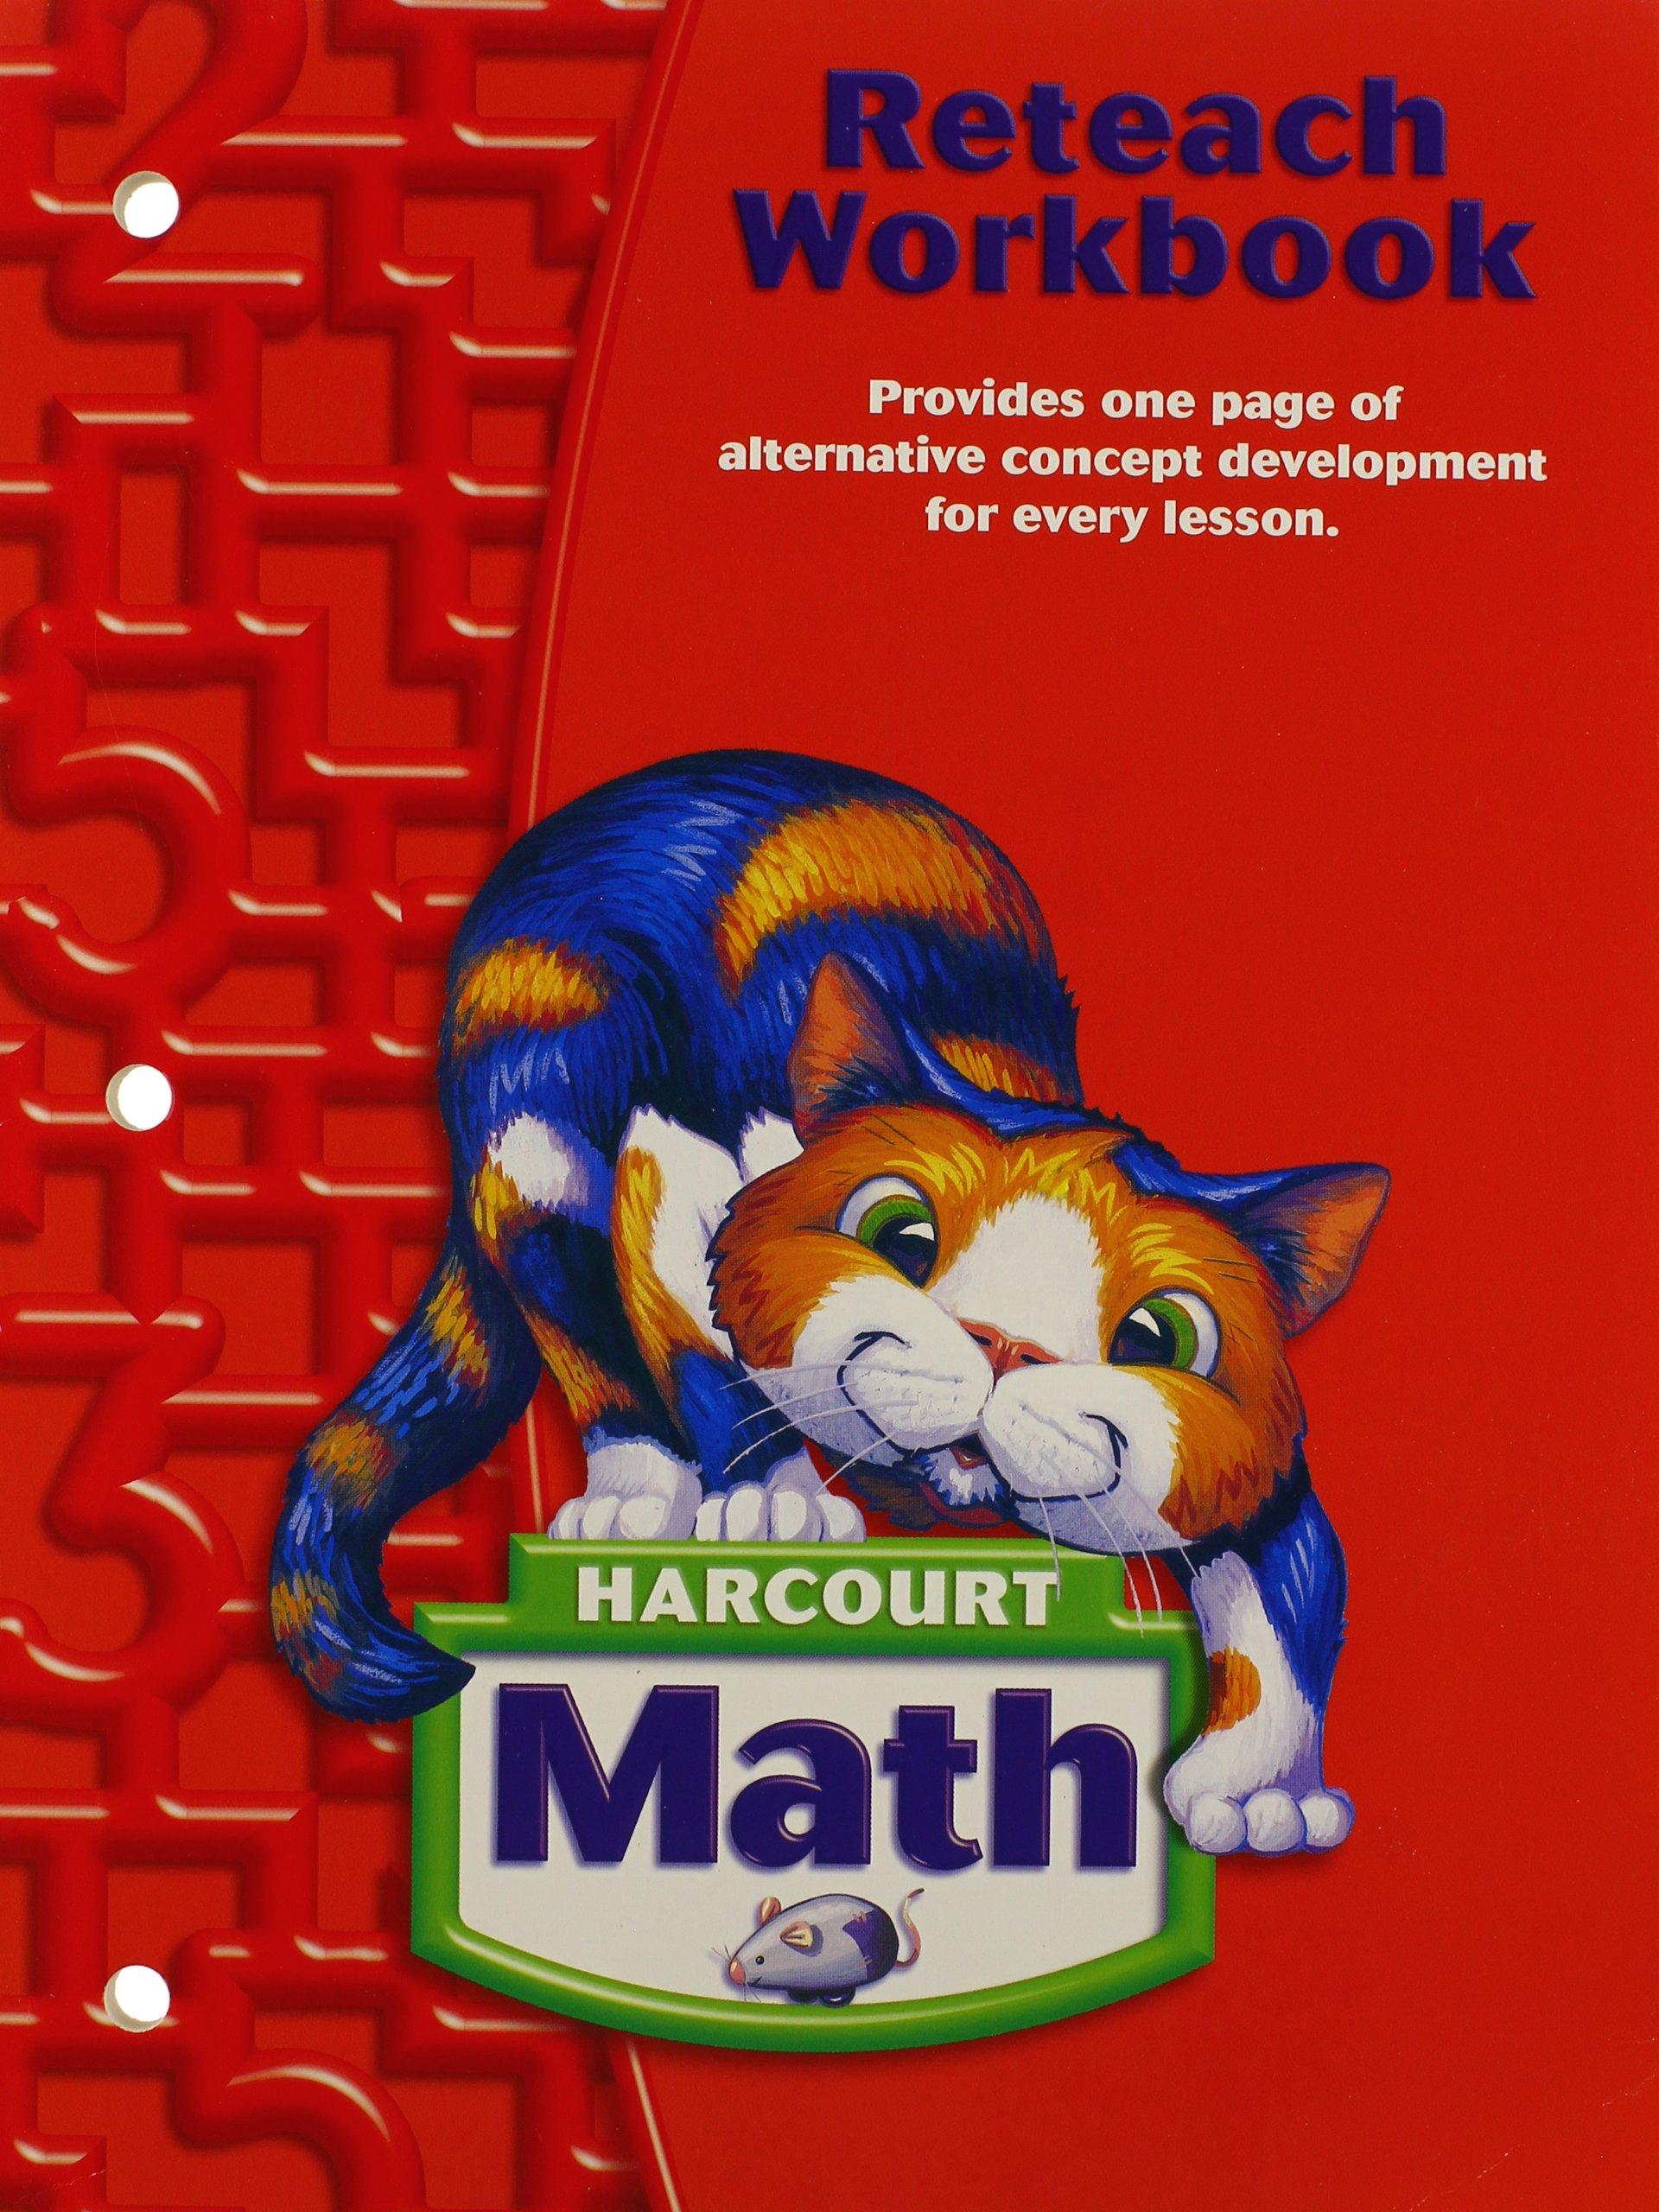 Harcourt Math: Reteach Workbook Grade 2: HARCOURT SCHOOL PUBLISHERS:  9780153364884: Amazon.com: Books